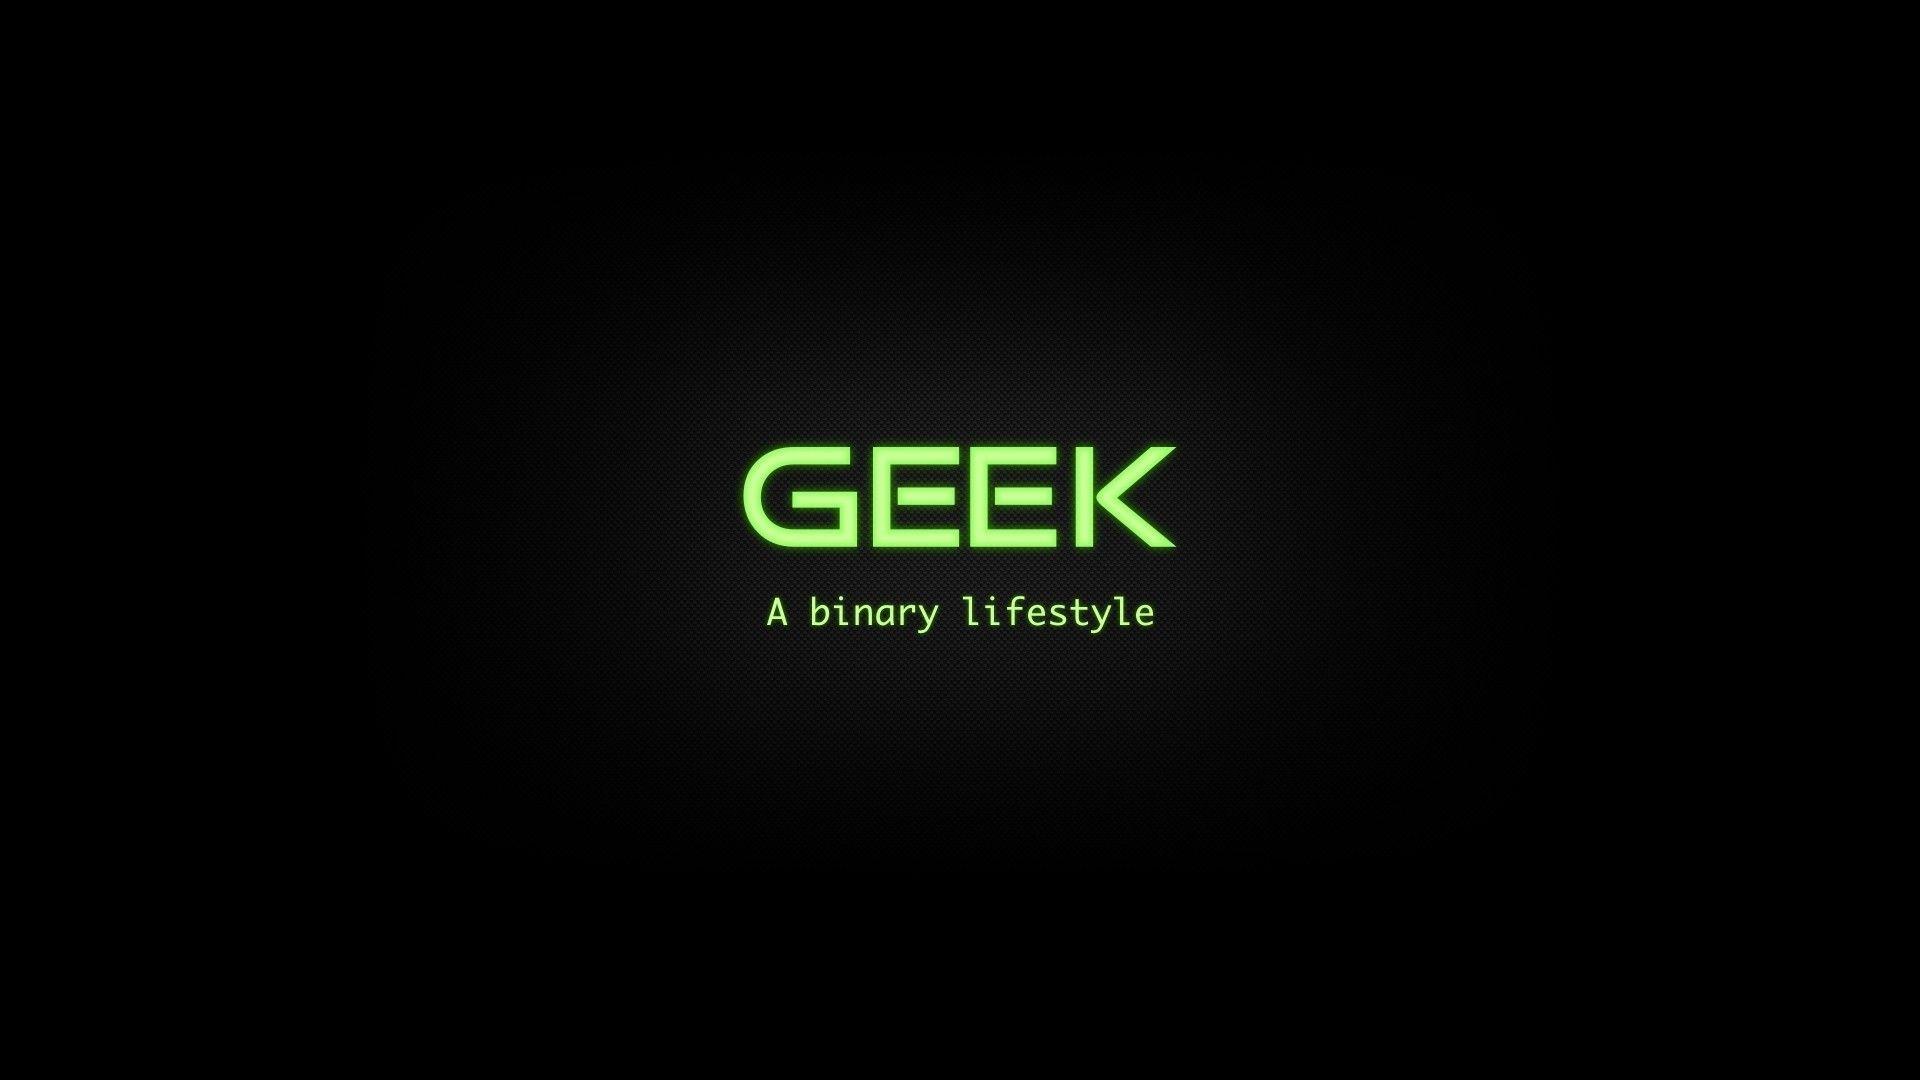 Geek Hd Wallpaper Wallpaper Hd